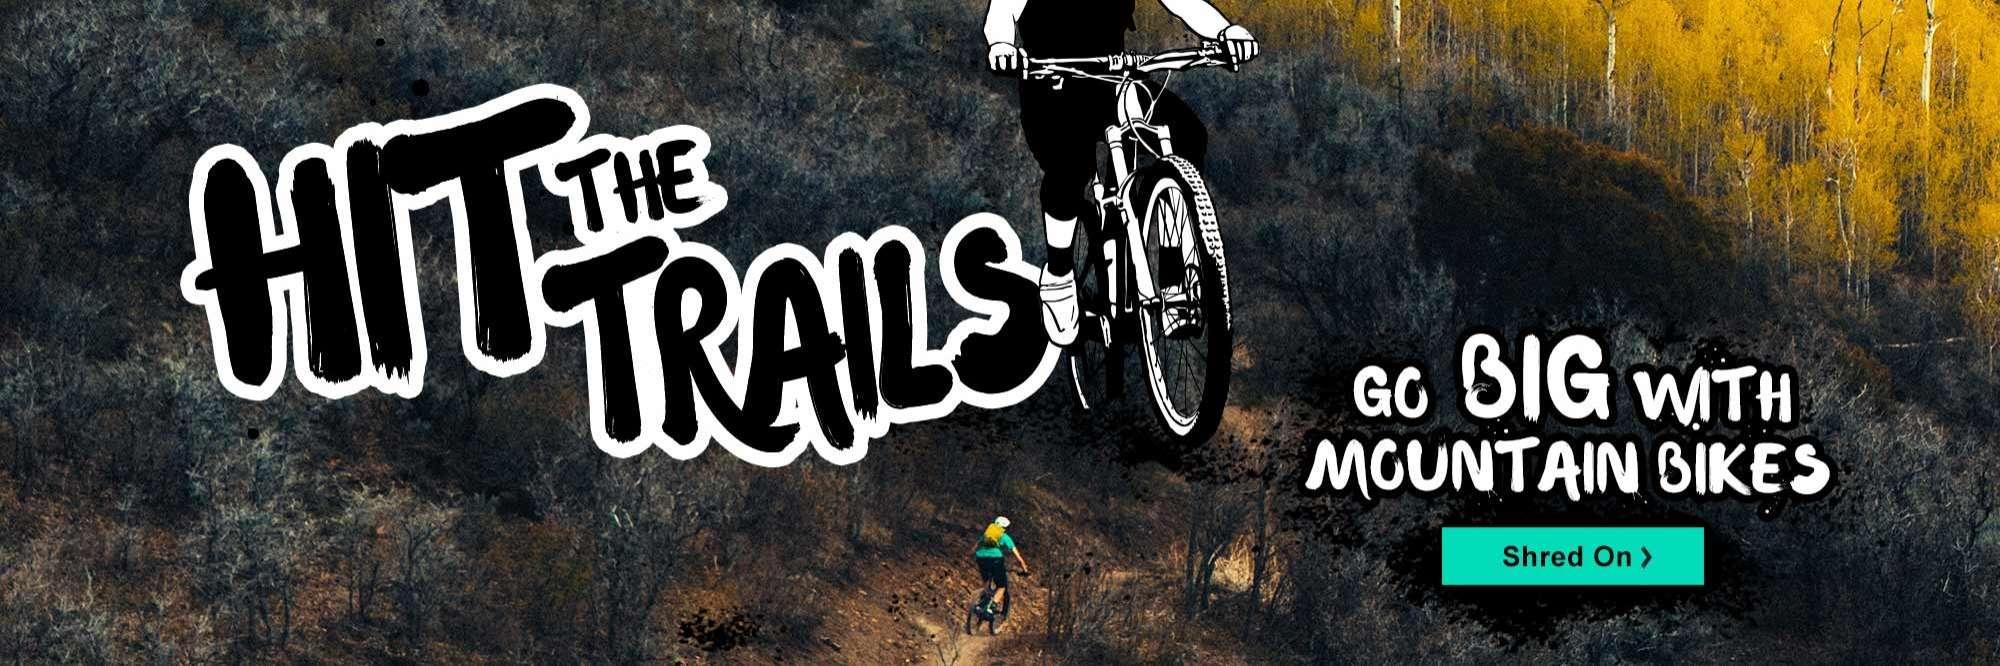 Allis Bike & Fitness West Allis, WI 53227 414-327-1290